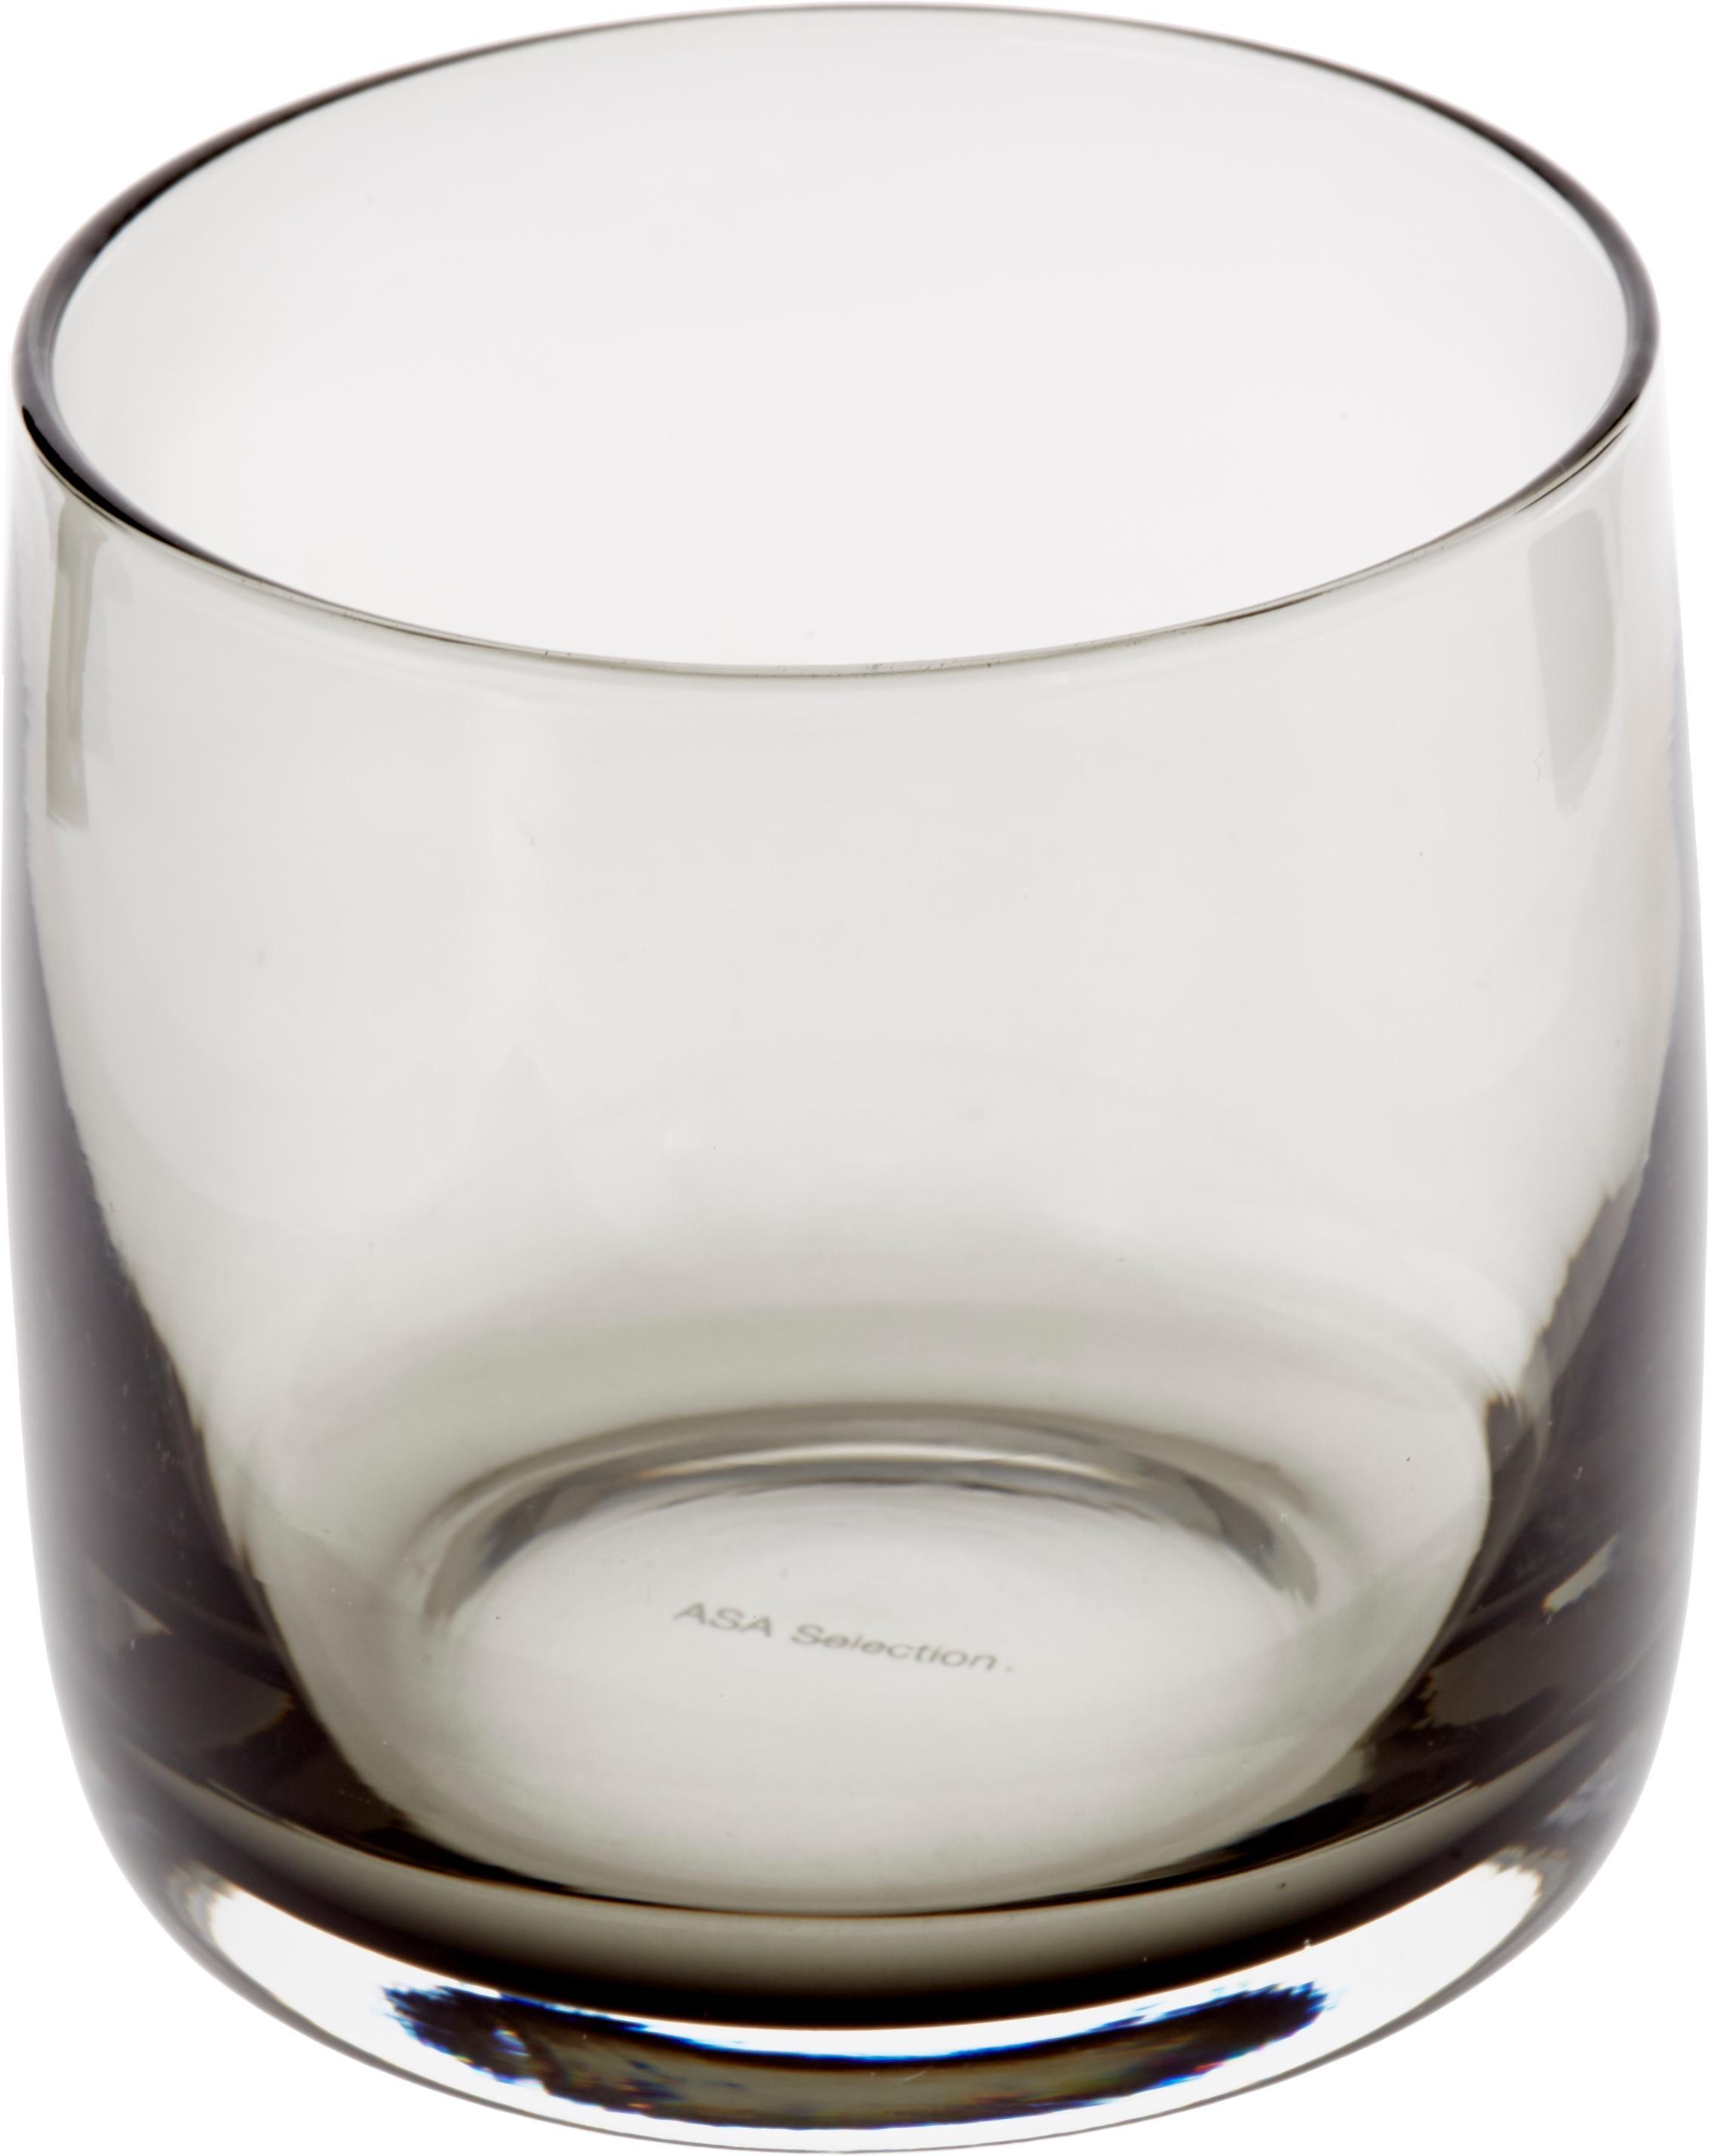 Handgemachte Wassergläser Colored in Grau transparent, 6 Stück, Glas, Grau, transparent, Ø 8 x H 8 cm